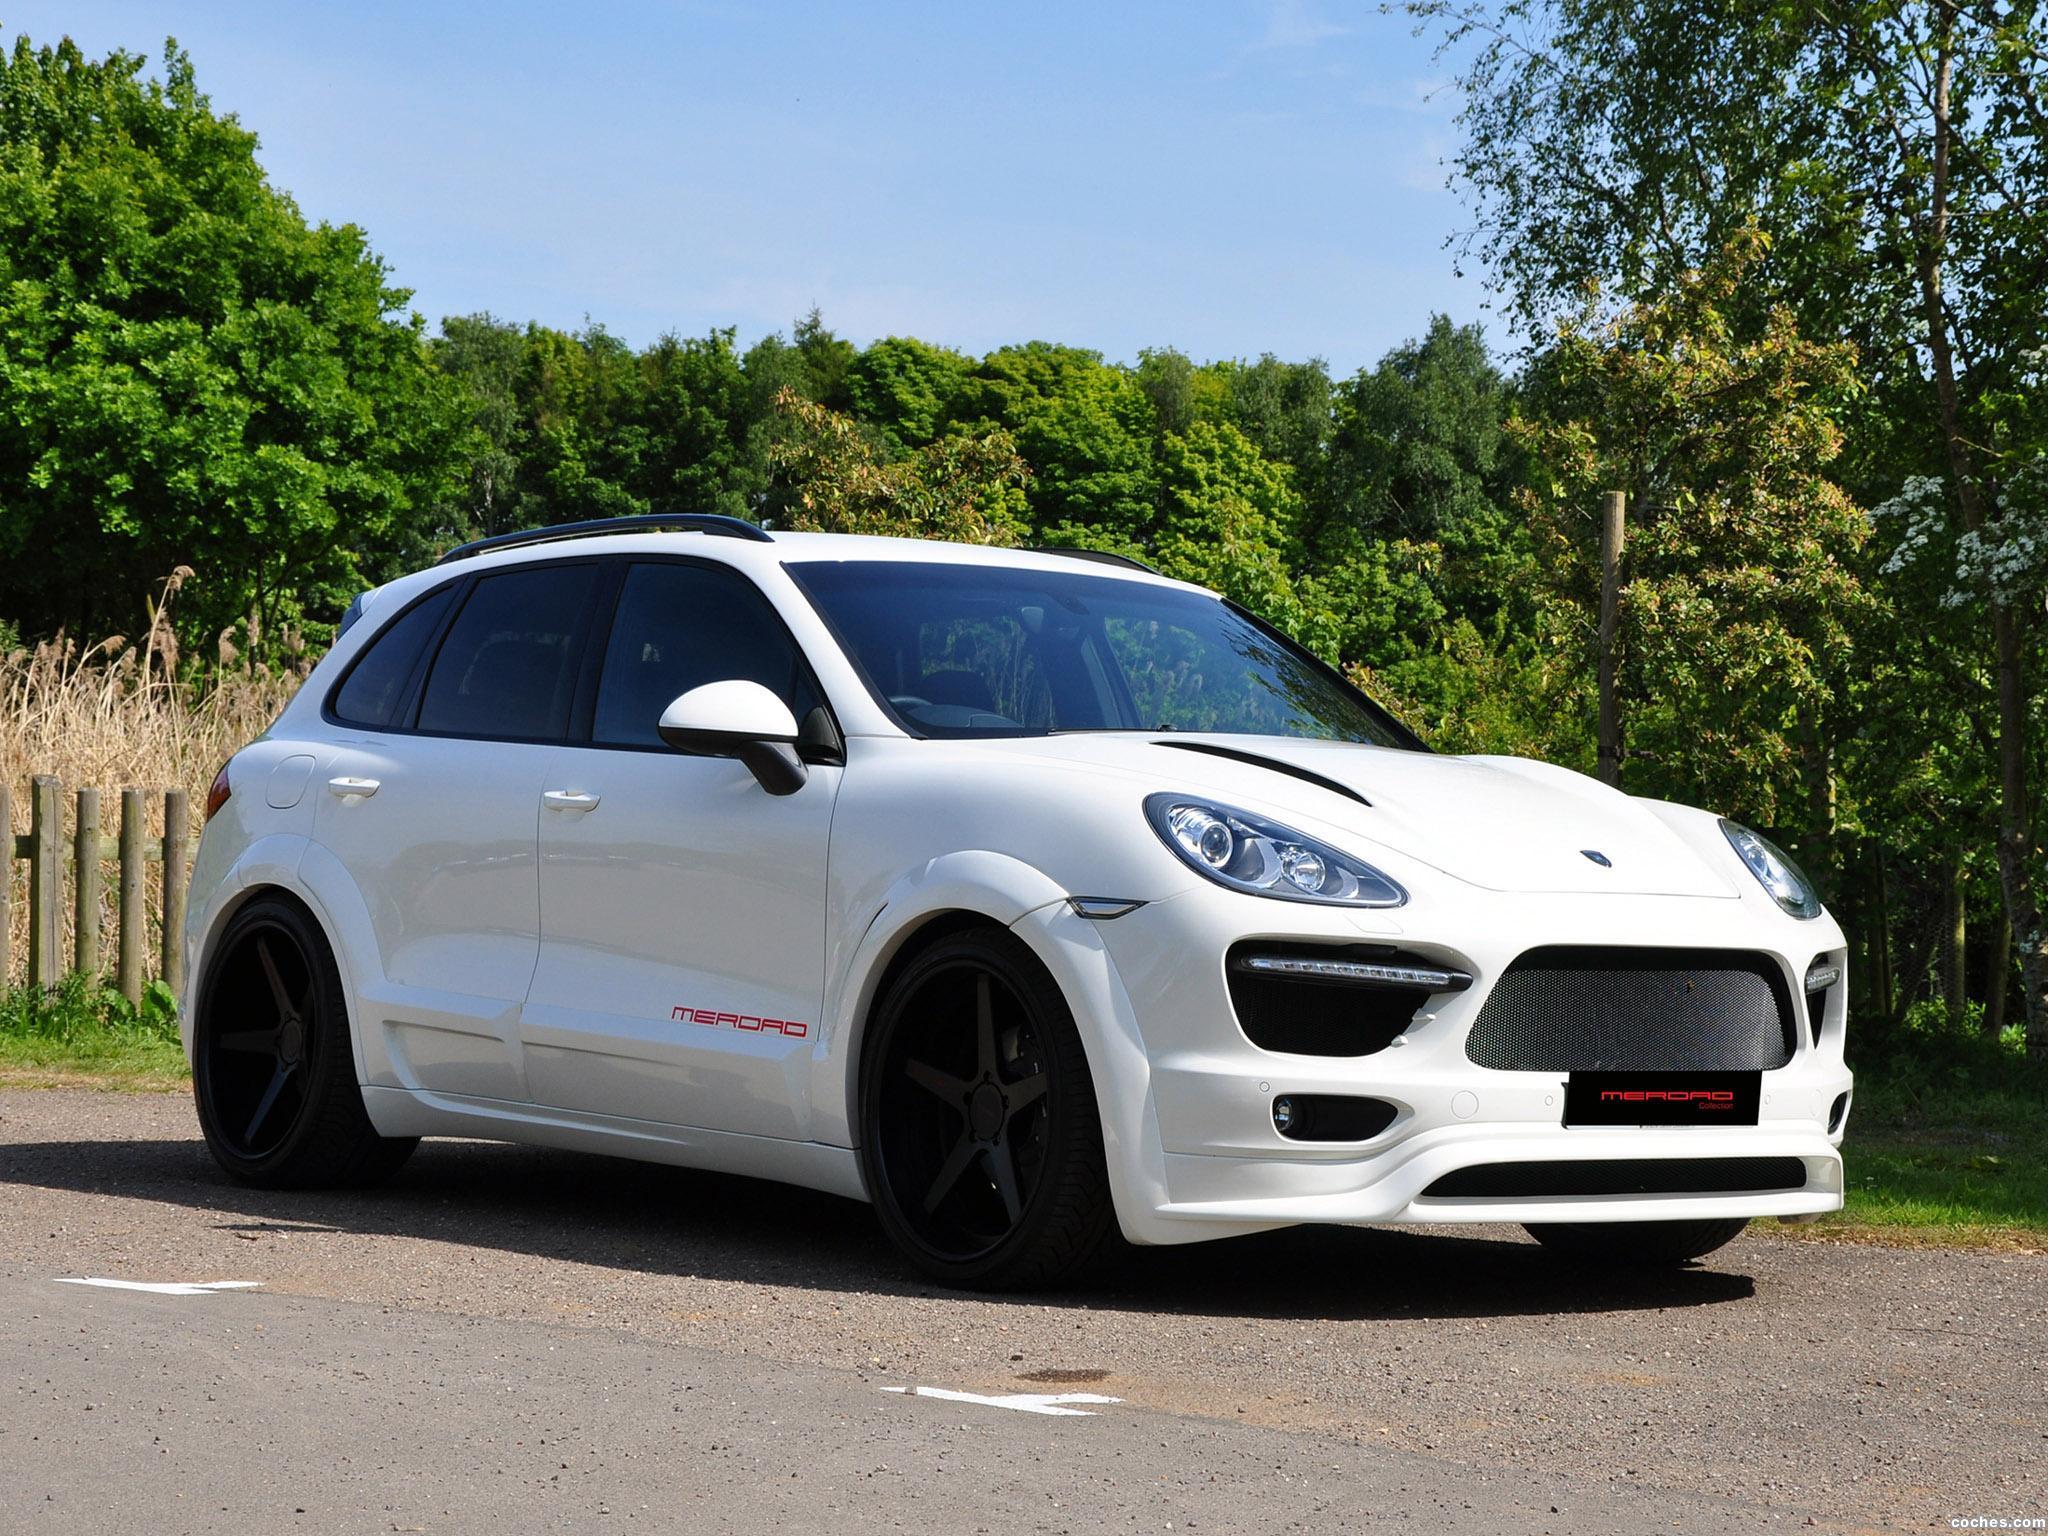 Foto 3 de Merdad Porsche Cayenne 958 2011